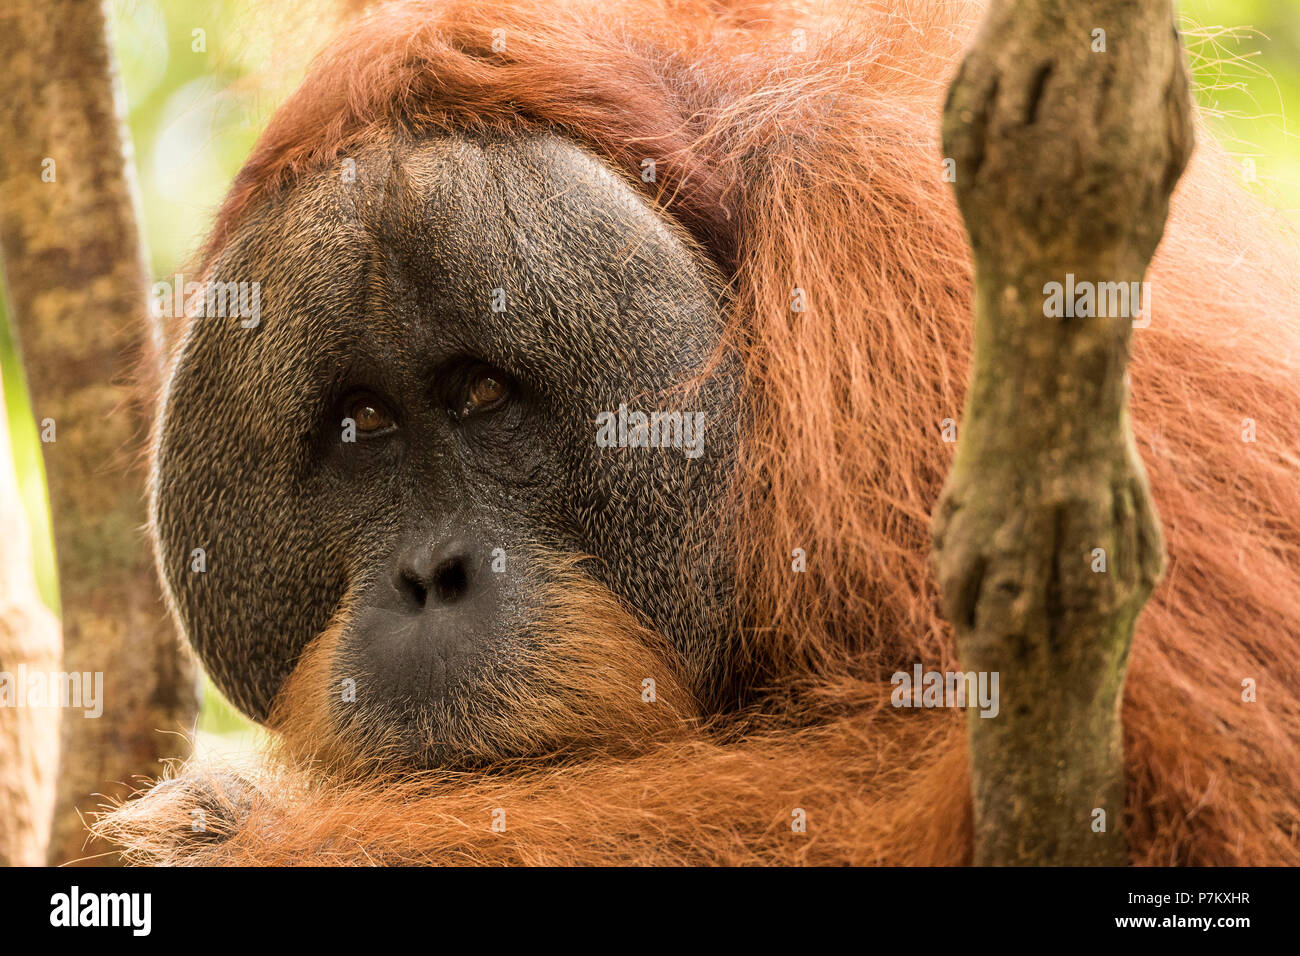 Male orangutan in the in indonesian jungle - Stock Image